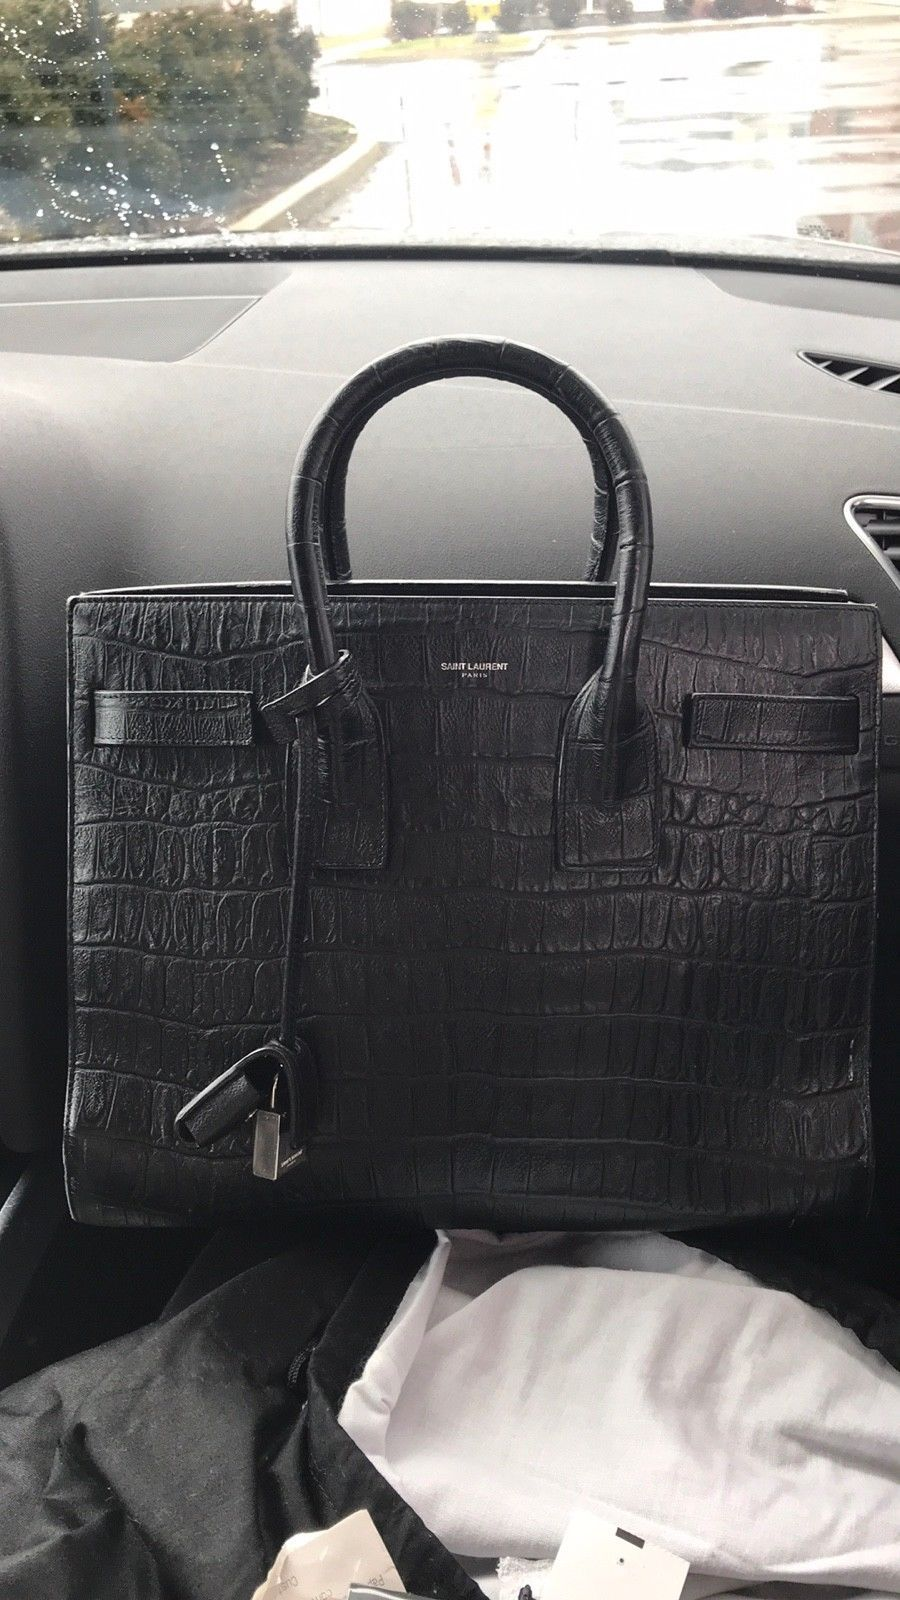 e1b2cdb4d3 Black YSL Saint Laurent Sac de Jour Crocodile Embossed Leather ...